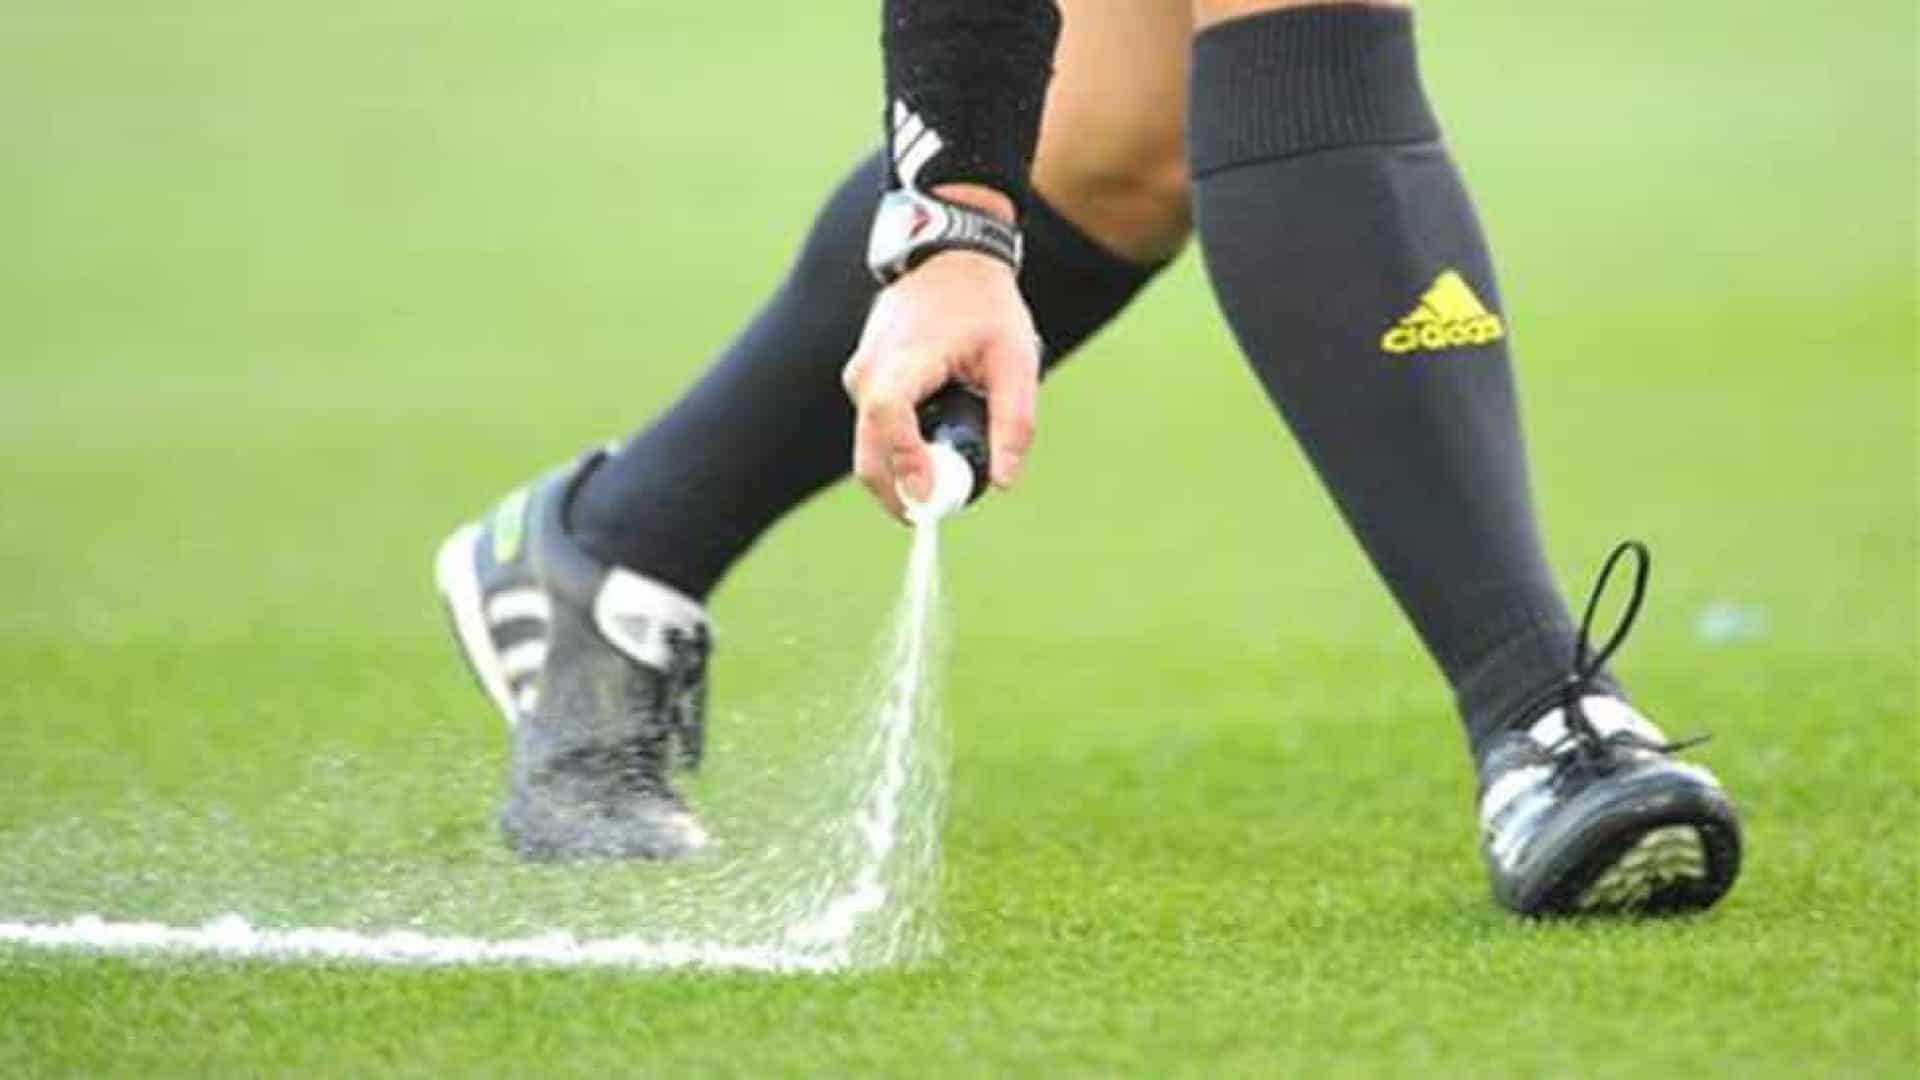 O anúncio foi feito, nesta quinta-feira, pela Fifa